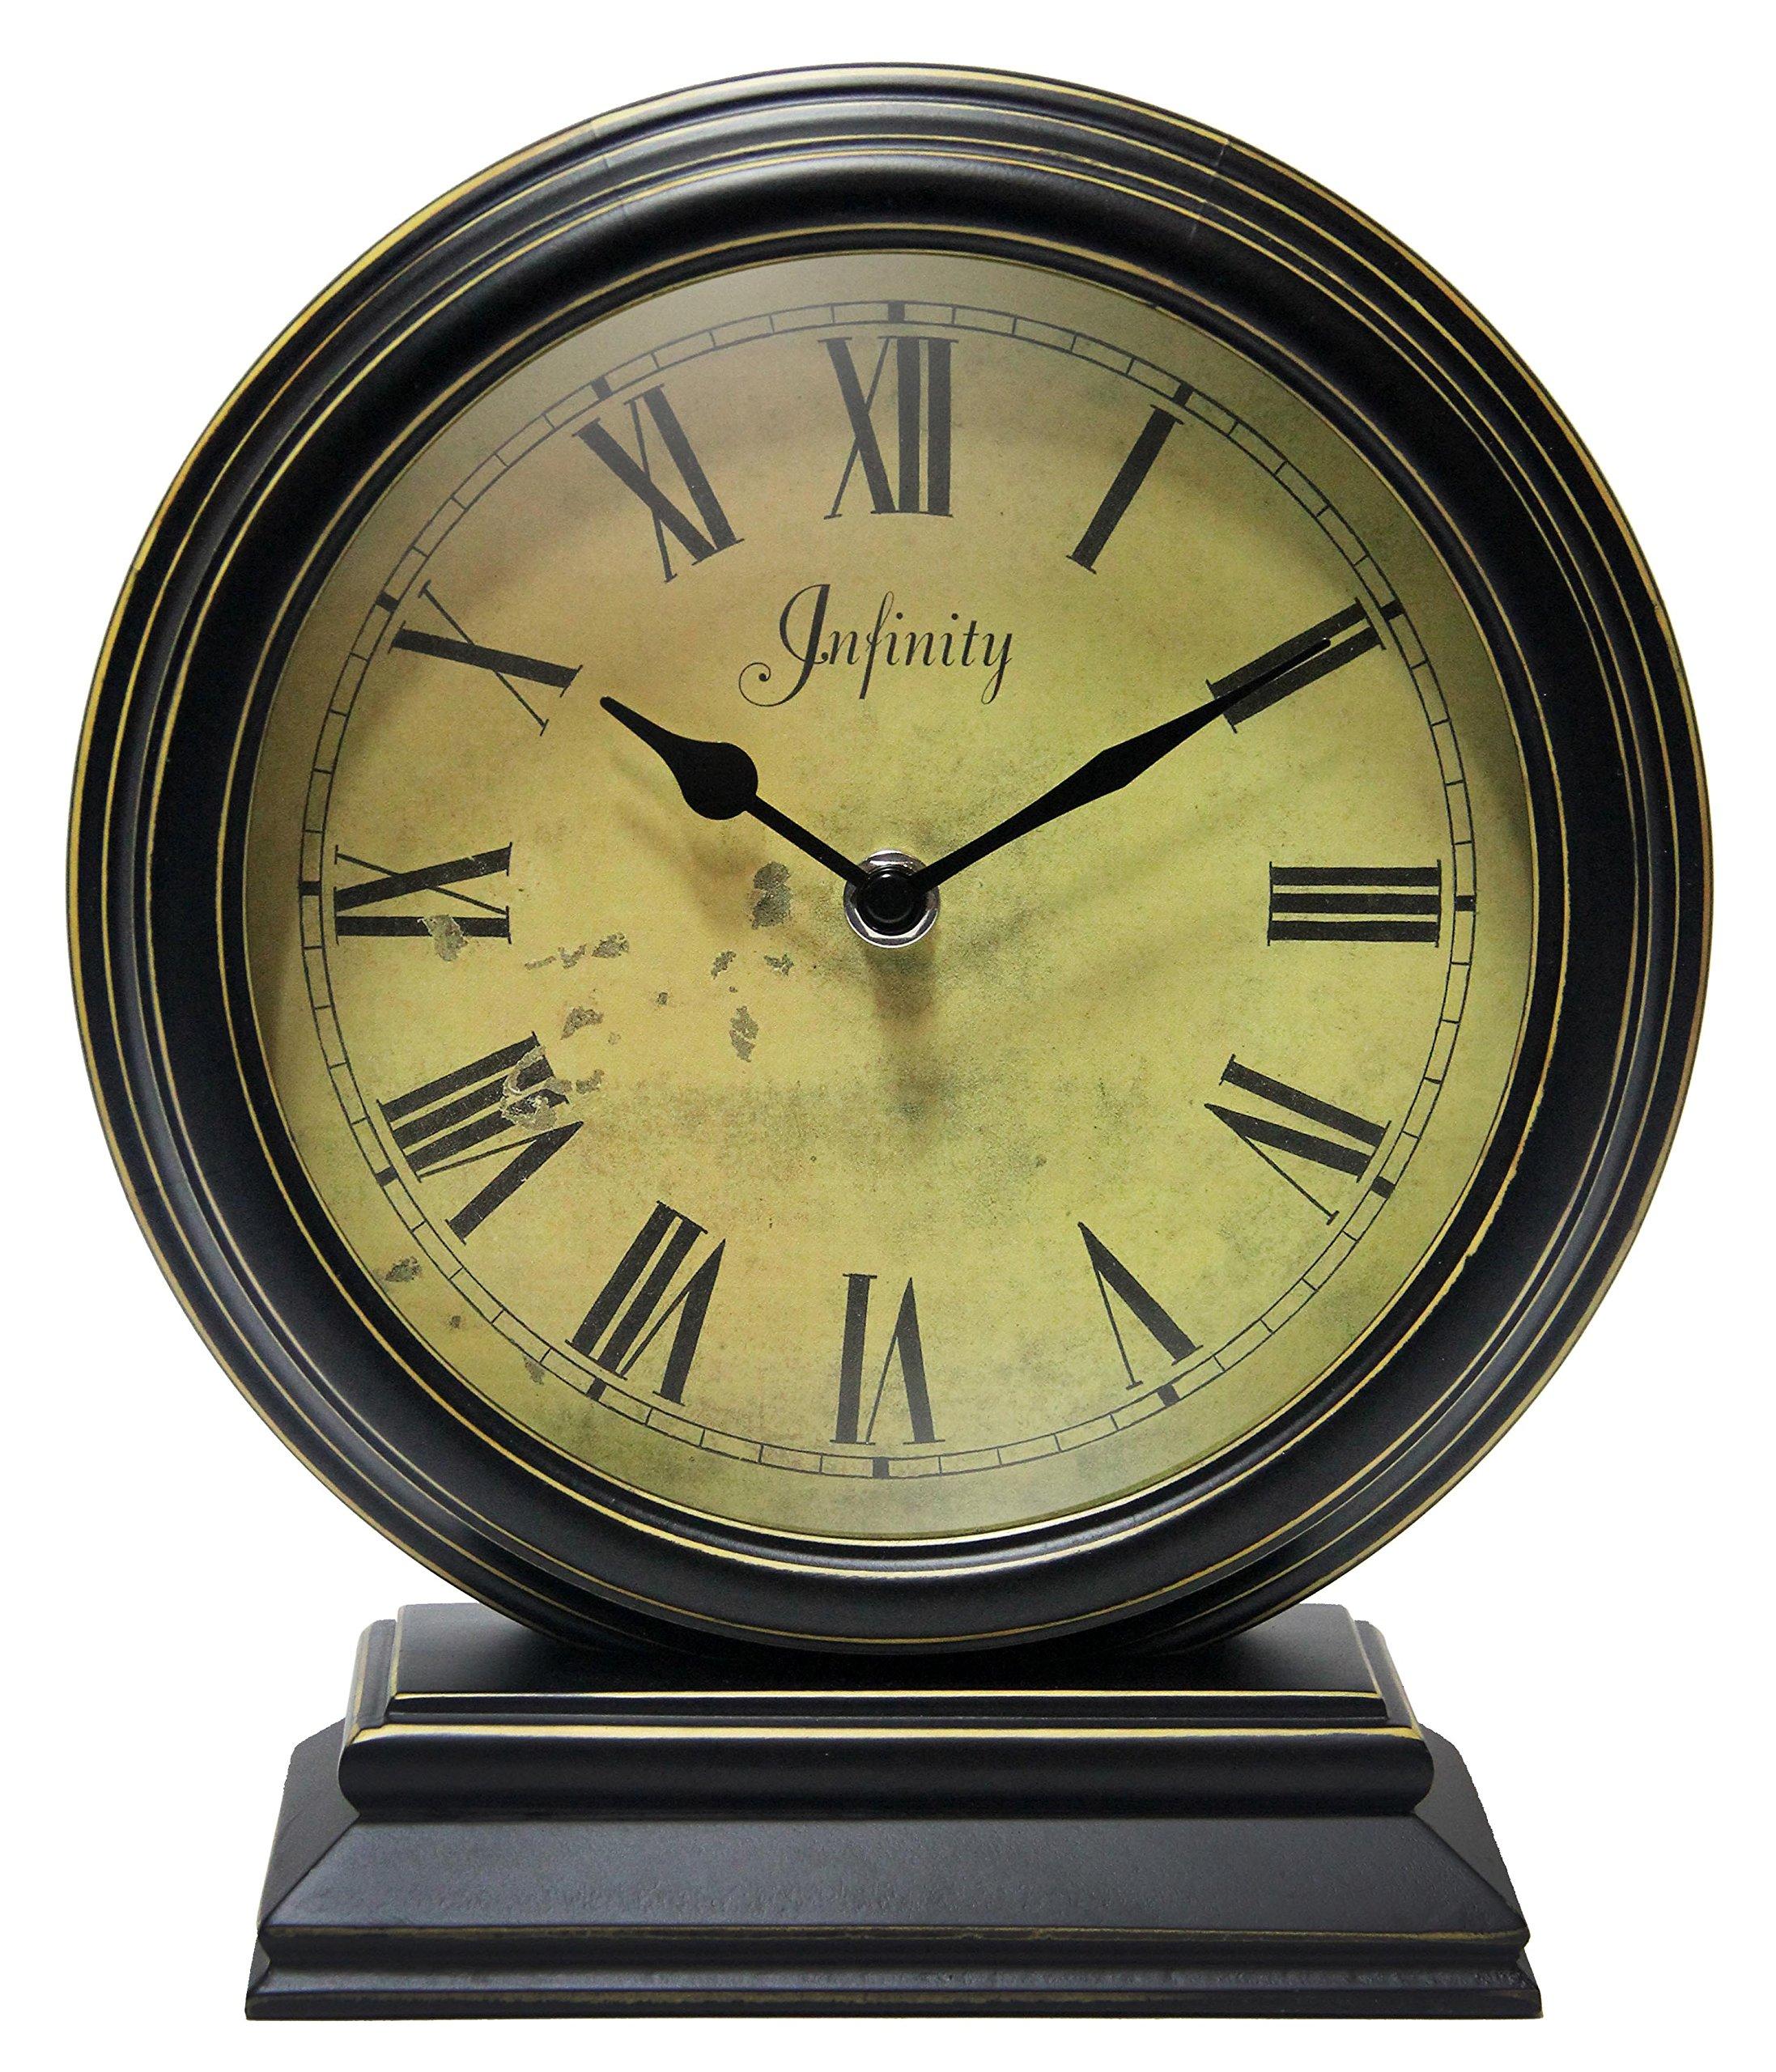 SZ02 HD Glass Lens European Style Vintage Silent Desk Alarm Clock Non Ticking Quartz Movement Battery Operated Easy to Read JUSTUP 5.5 Classic Retro Clock